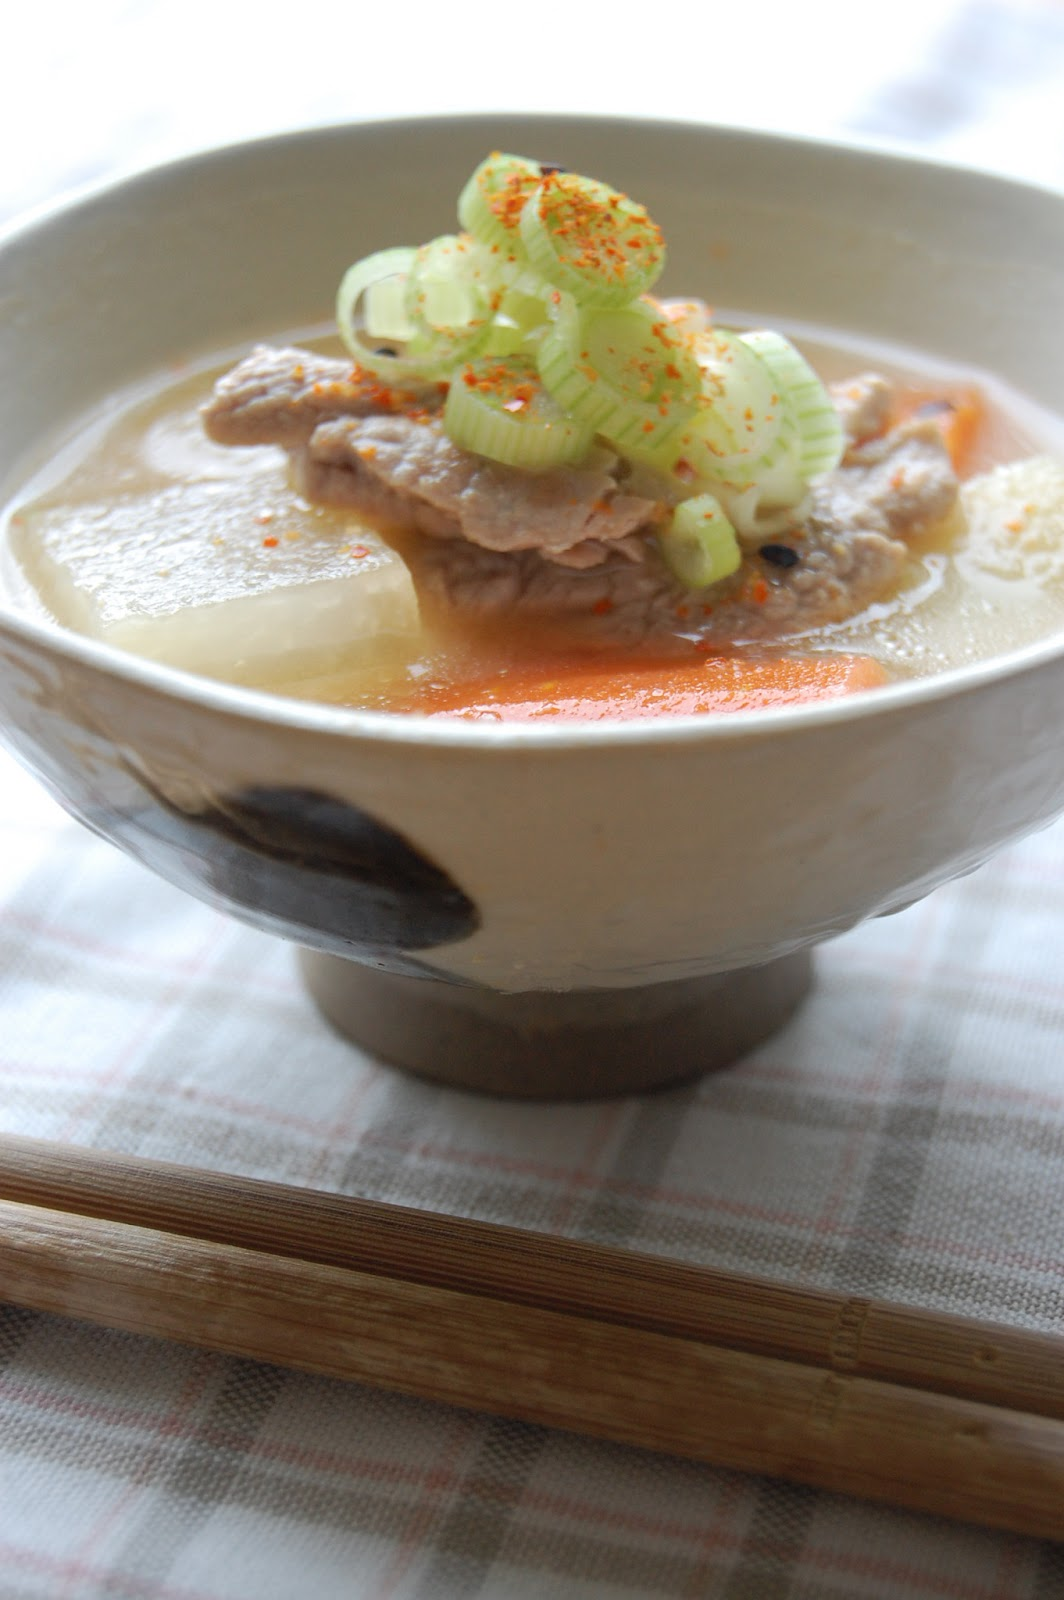 Fiona's Japanese Cooking: JAPANESE TONJIRU RECIPE - PORK SOUP